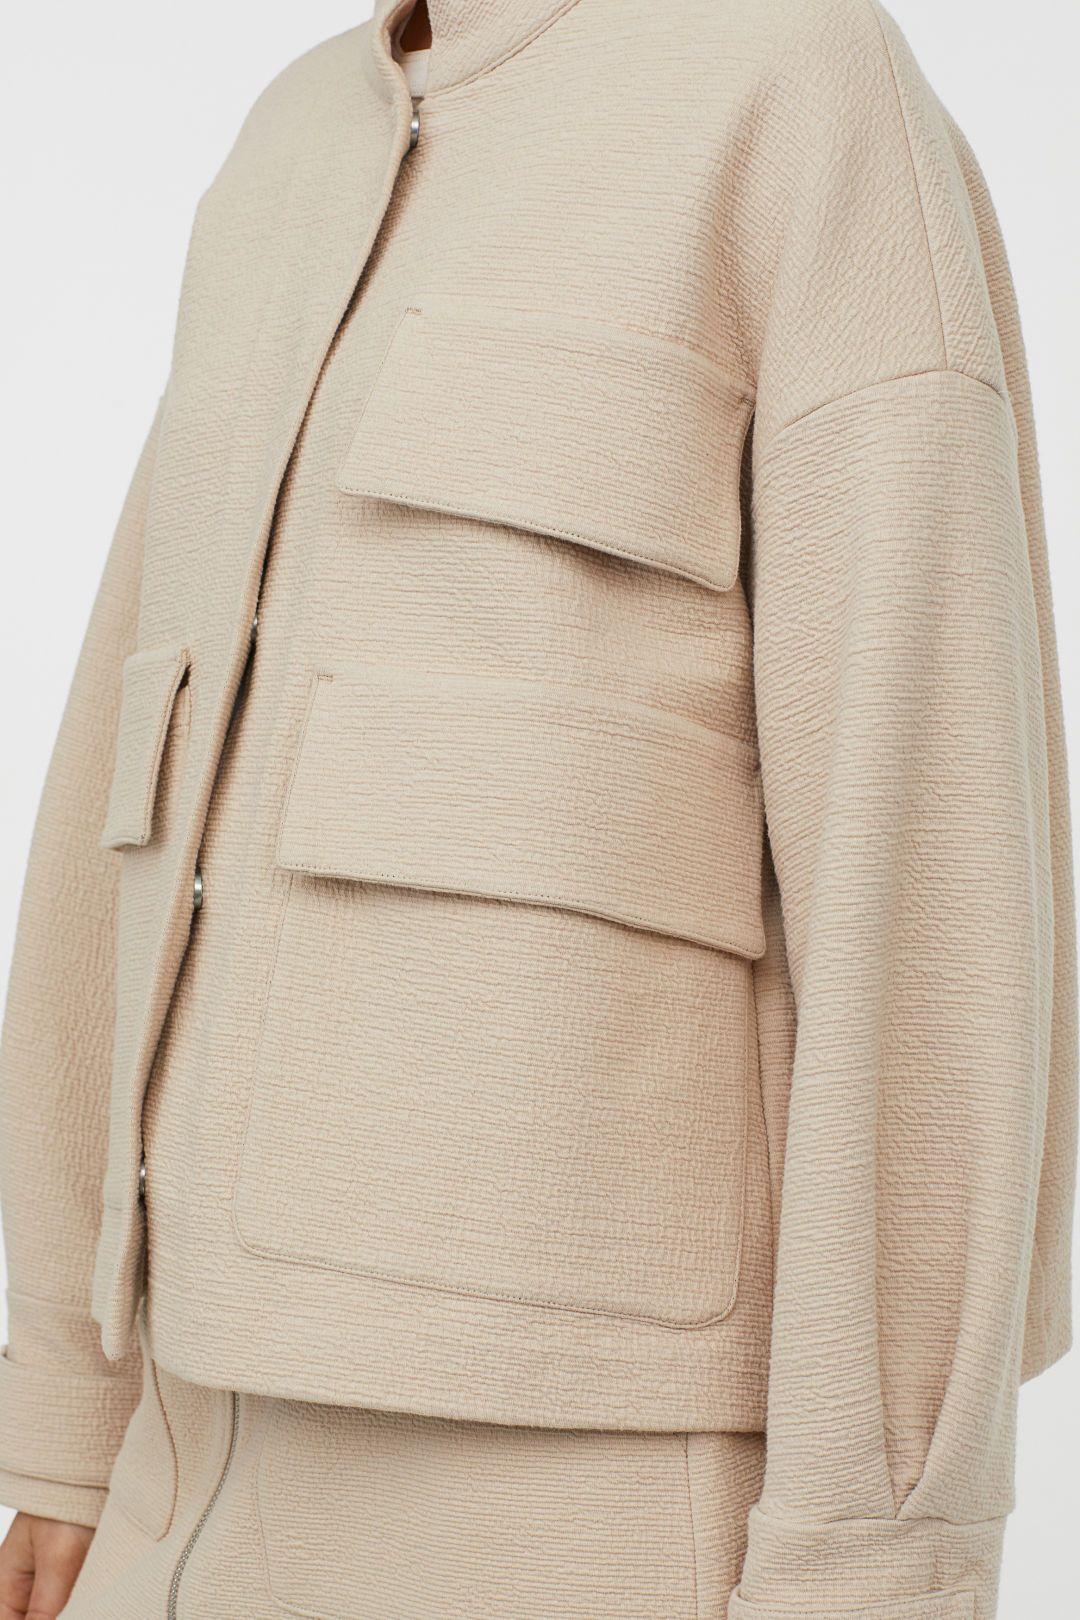 Oversized Jacket Light Beige Ladies H M Us Oversized Jacket Jackets Outerwear Jackets [ 1620 x 1080 Pixel ]